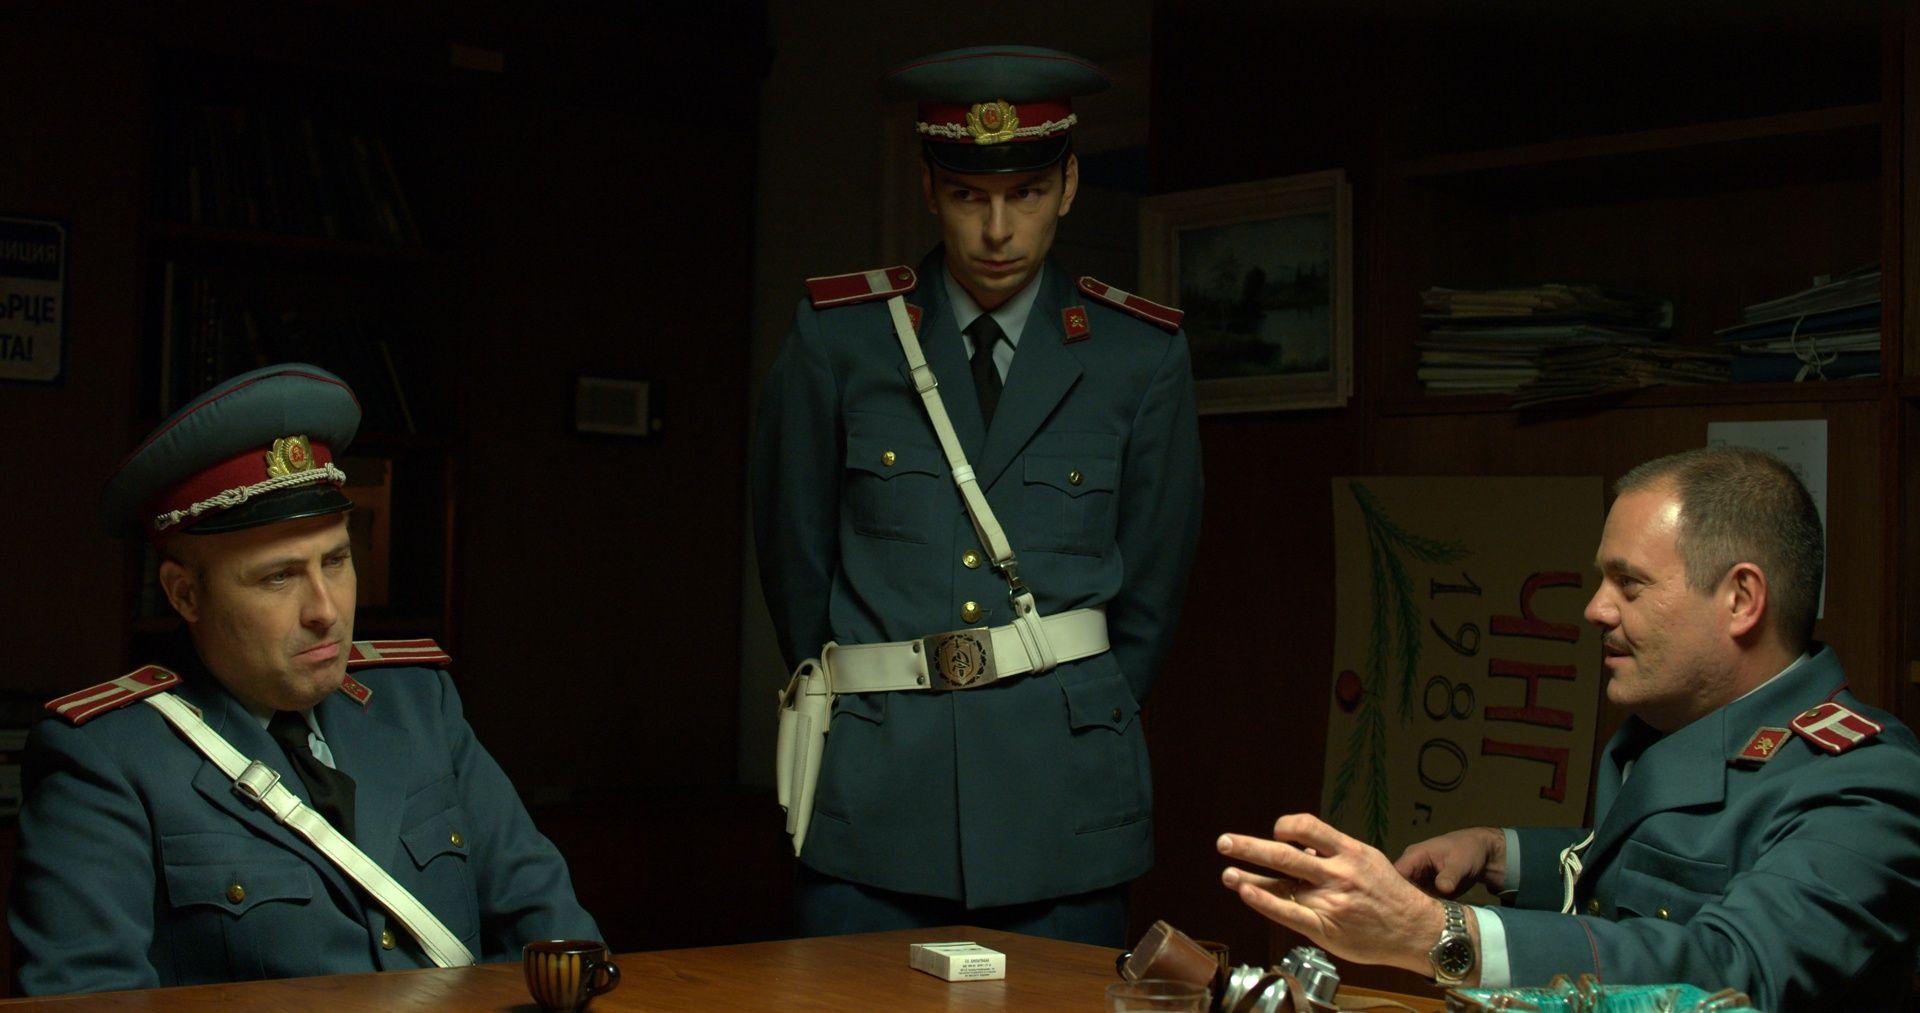 Trailer for the New Bulgarian film Short Straw